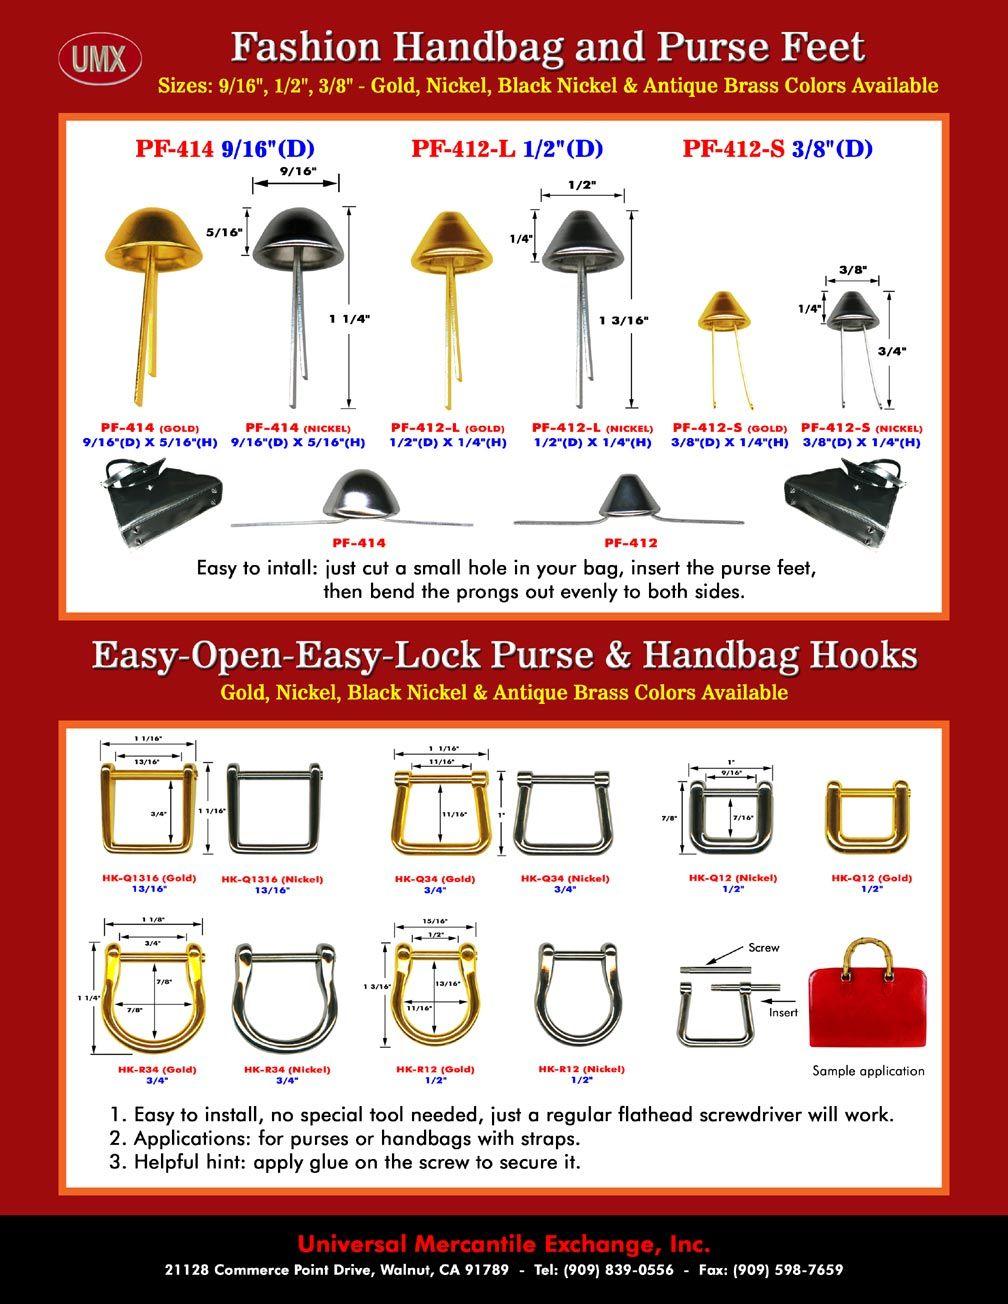 UMX Catalogues - Stylish Fashion Purse and Handbag Hardware